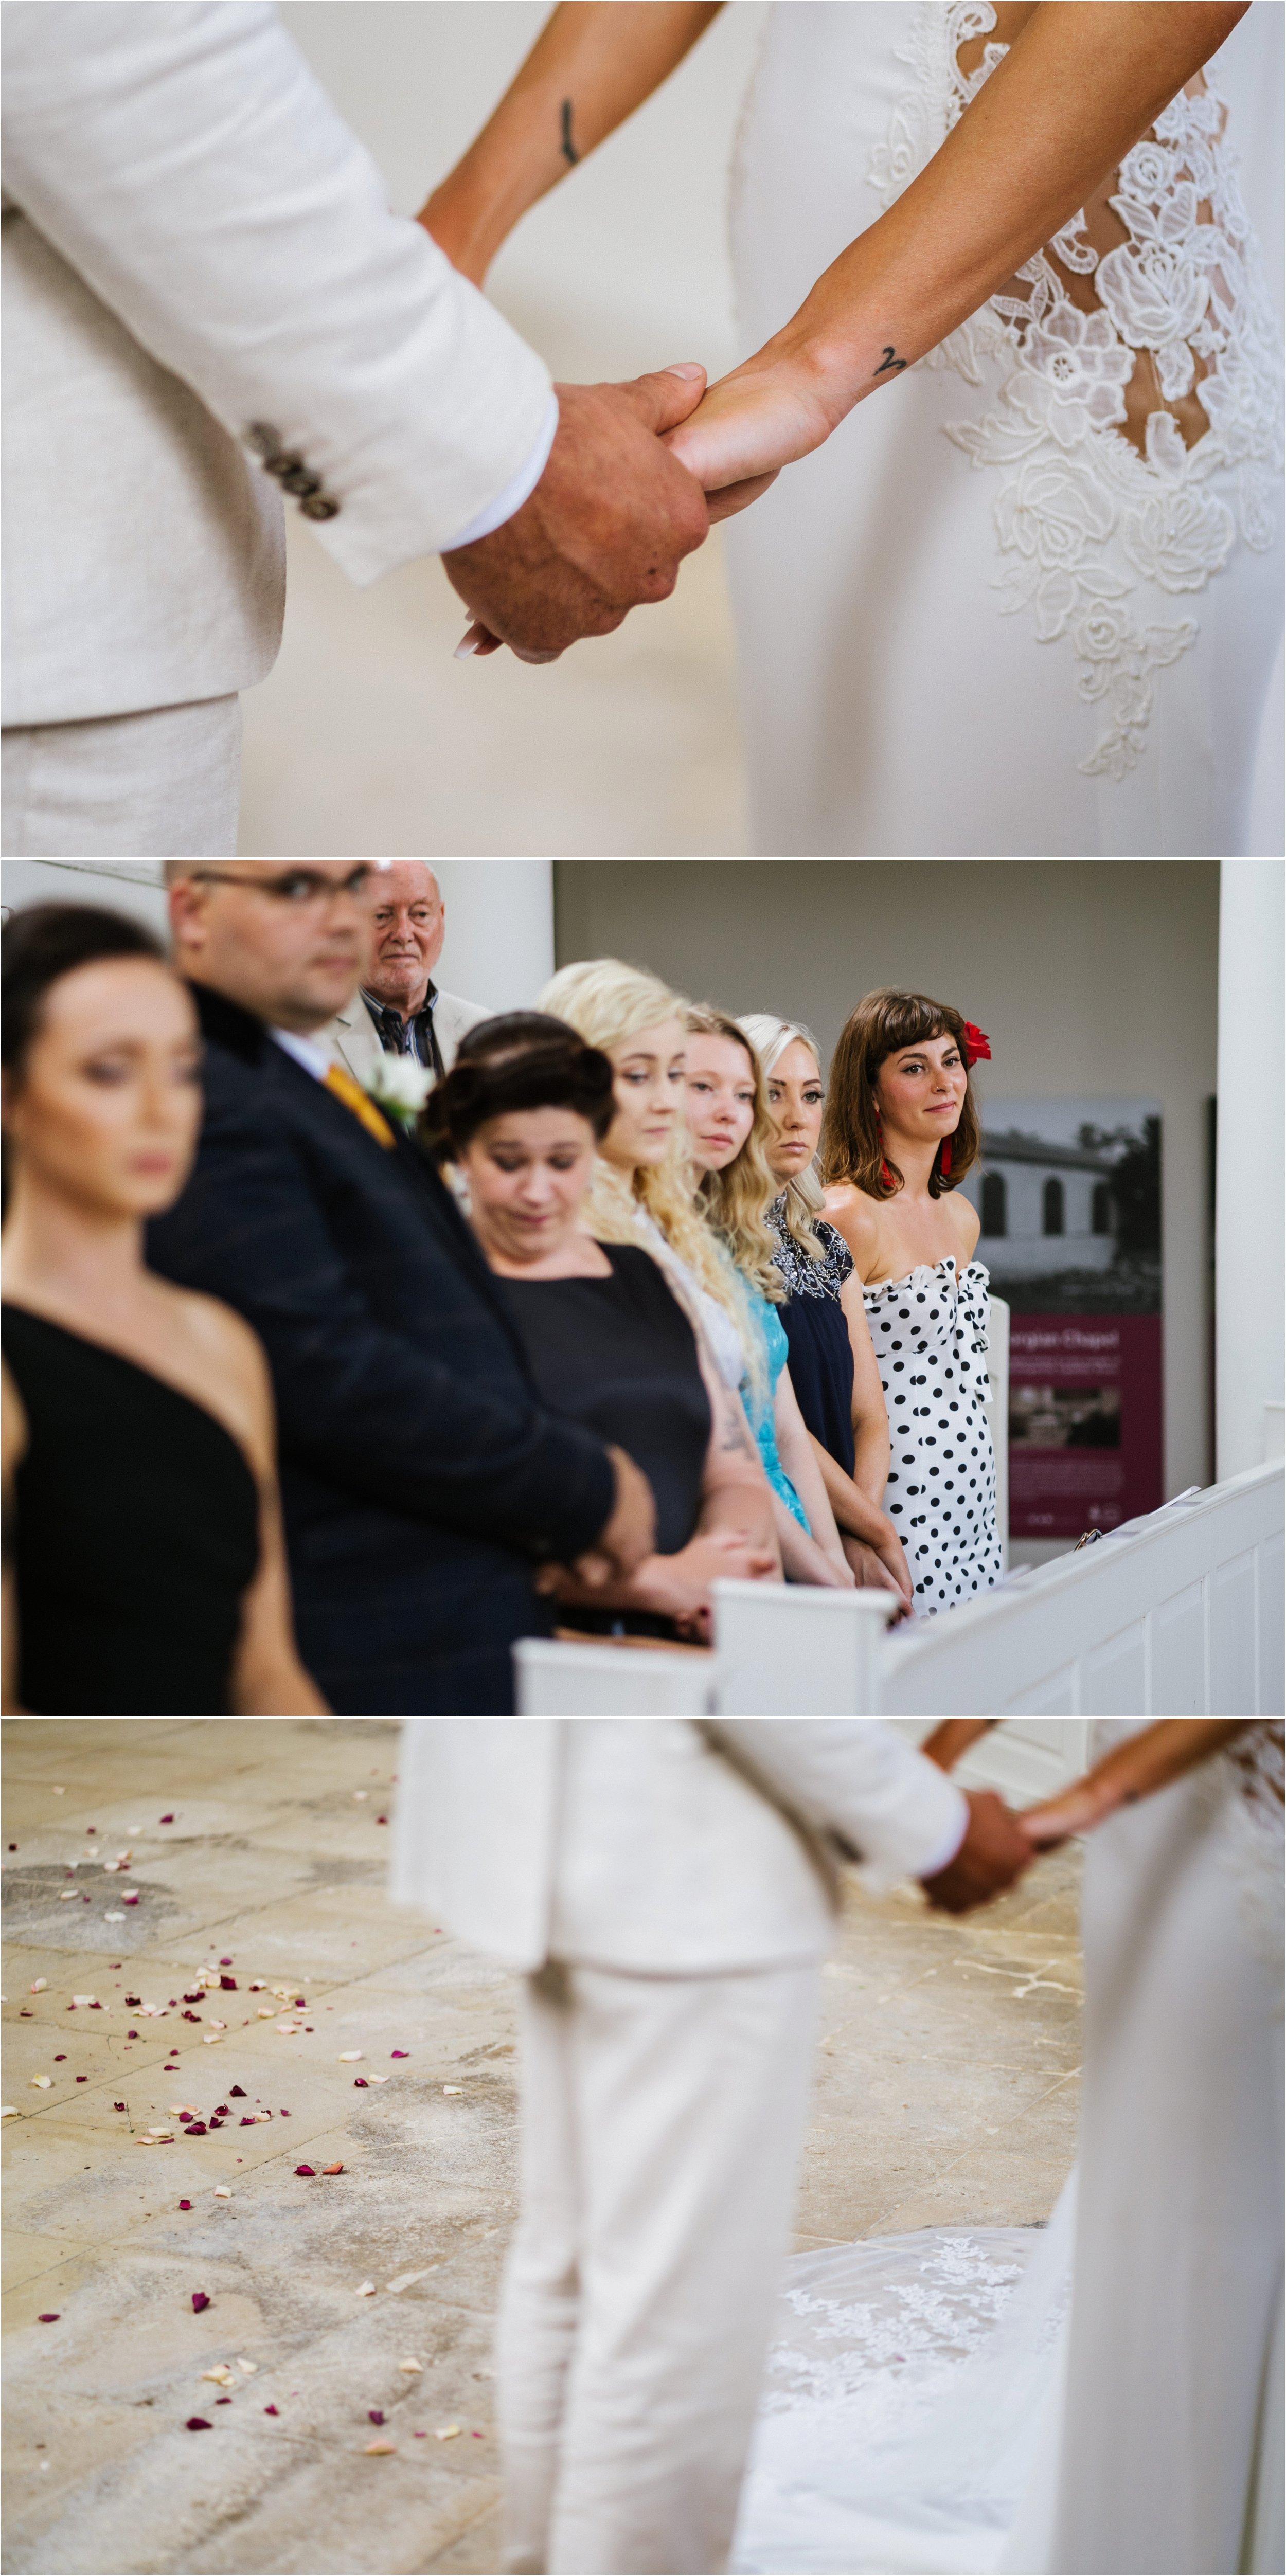 Compton Verney wedding photography_0060.jpg